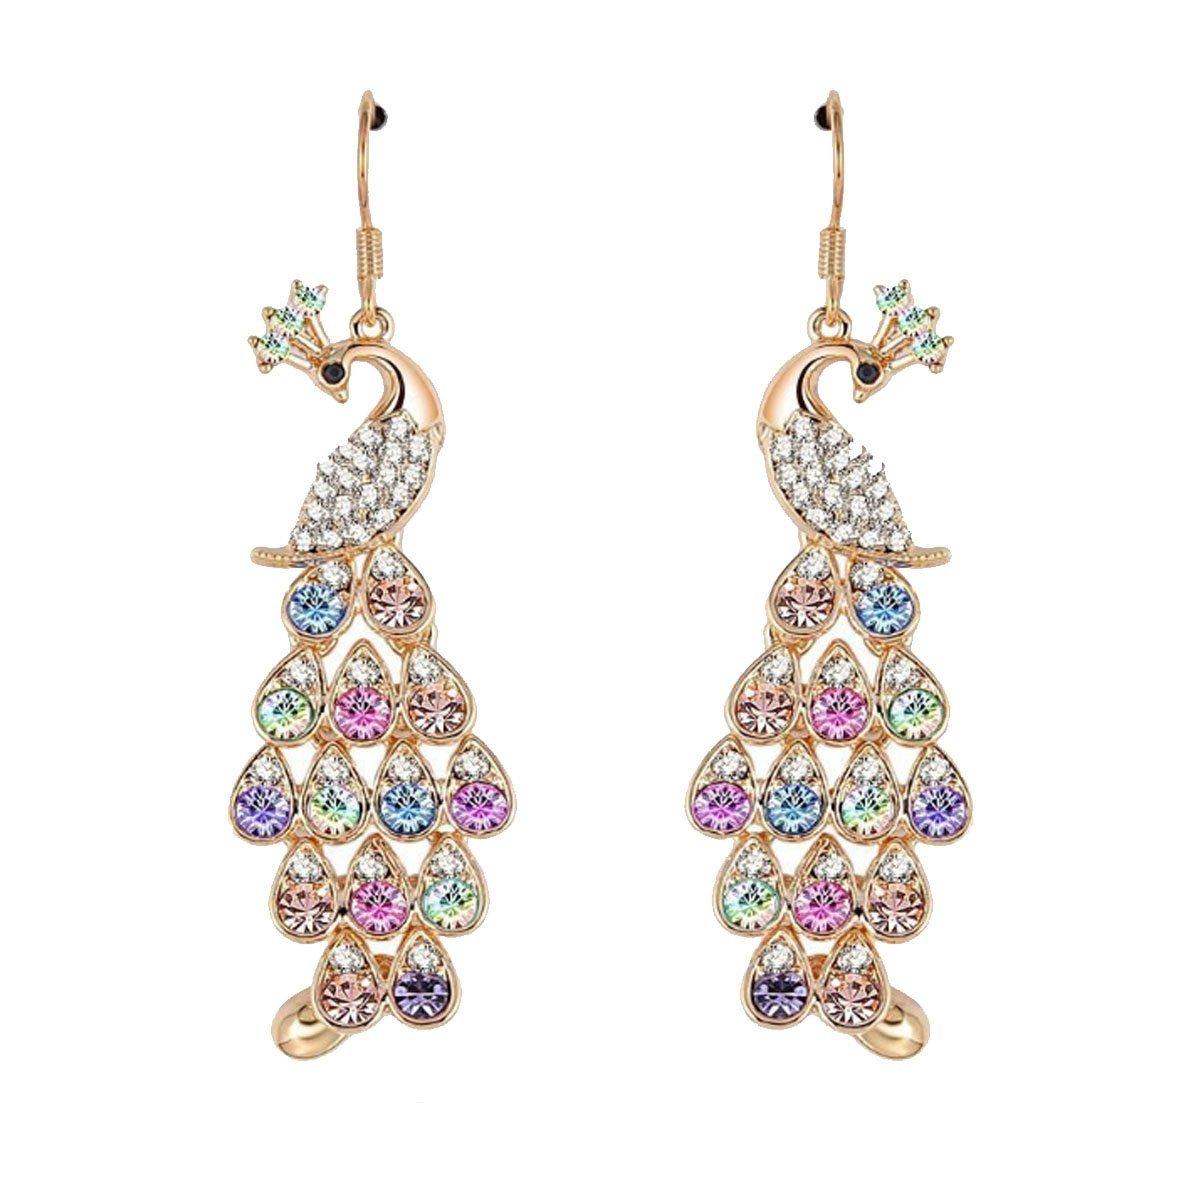 73fa32dcc88333 Get Quotations · Women Fashion Color Peacock Pendant Earrings Austrian  Crystal Jewelry (Women Jewelry, Wedding Earrings,